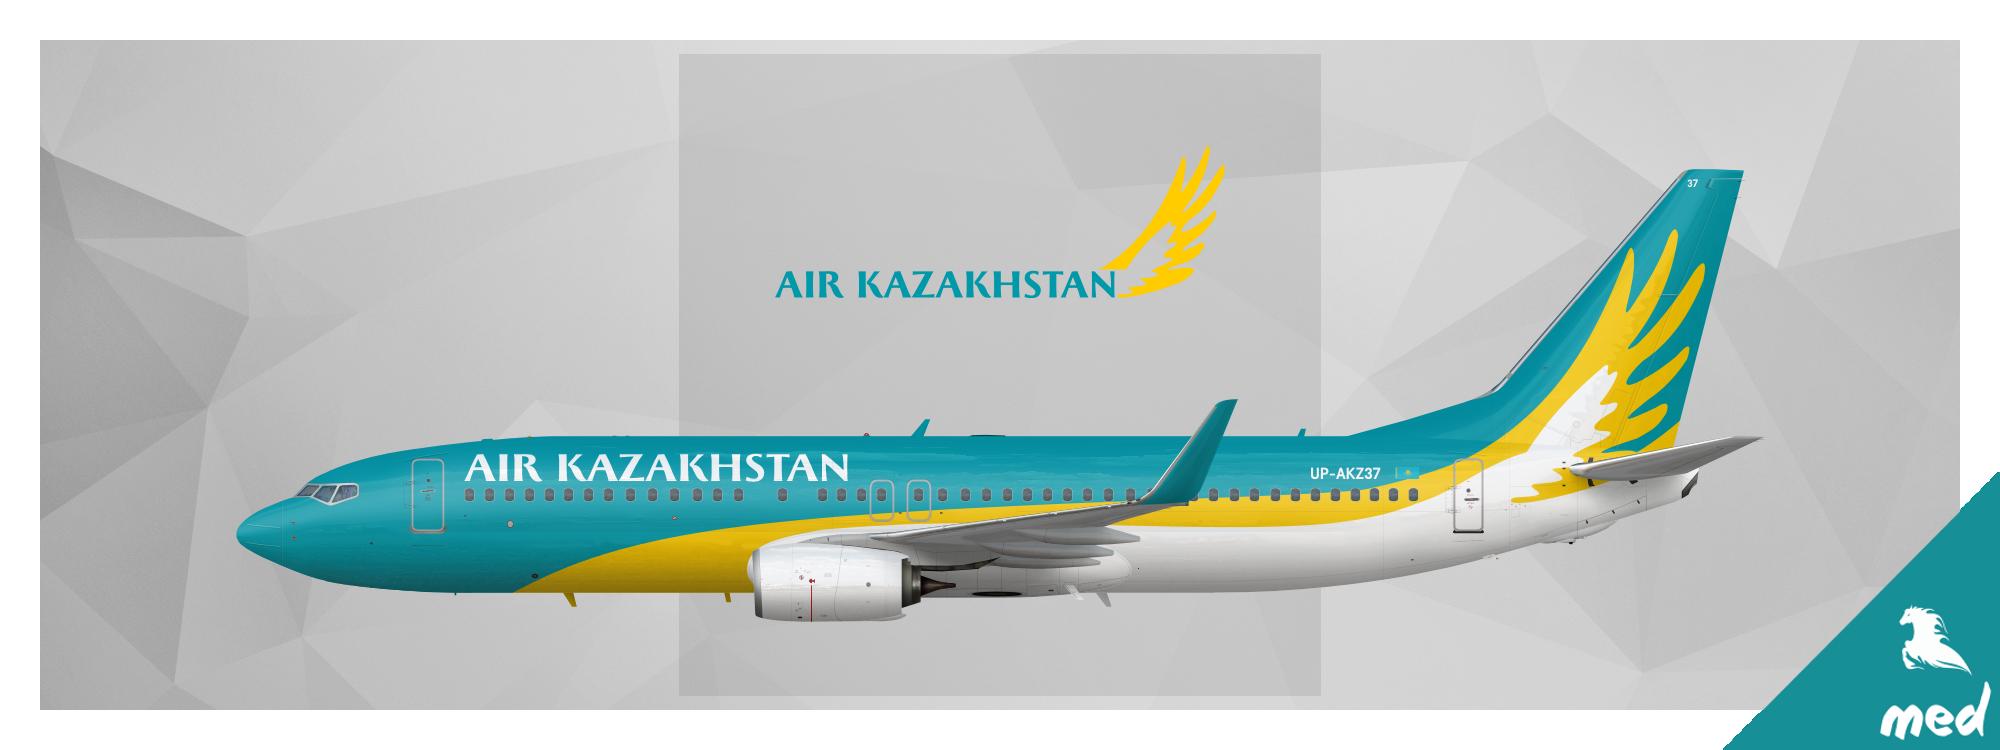 air kazakhstan boeing 737 800 skyswimmer s gallery of confidently rh airline empires com Boeing 787 Dreamliner Boeing X-51